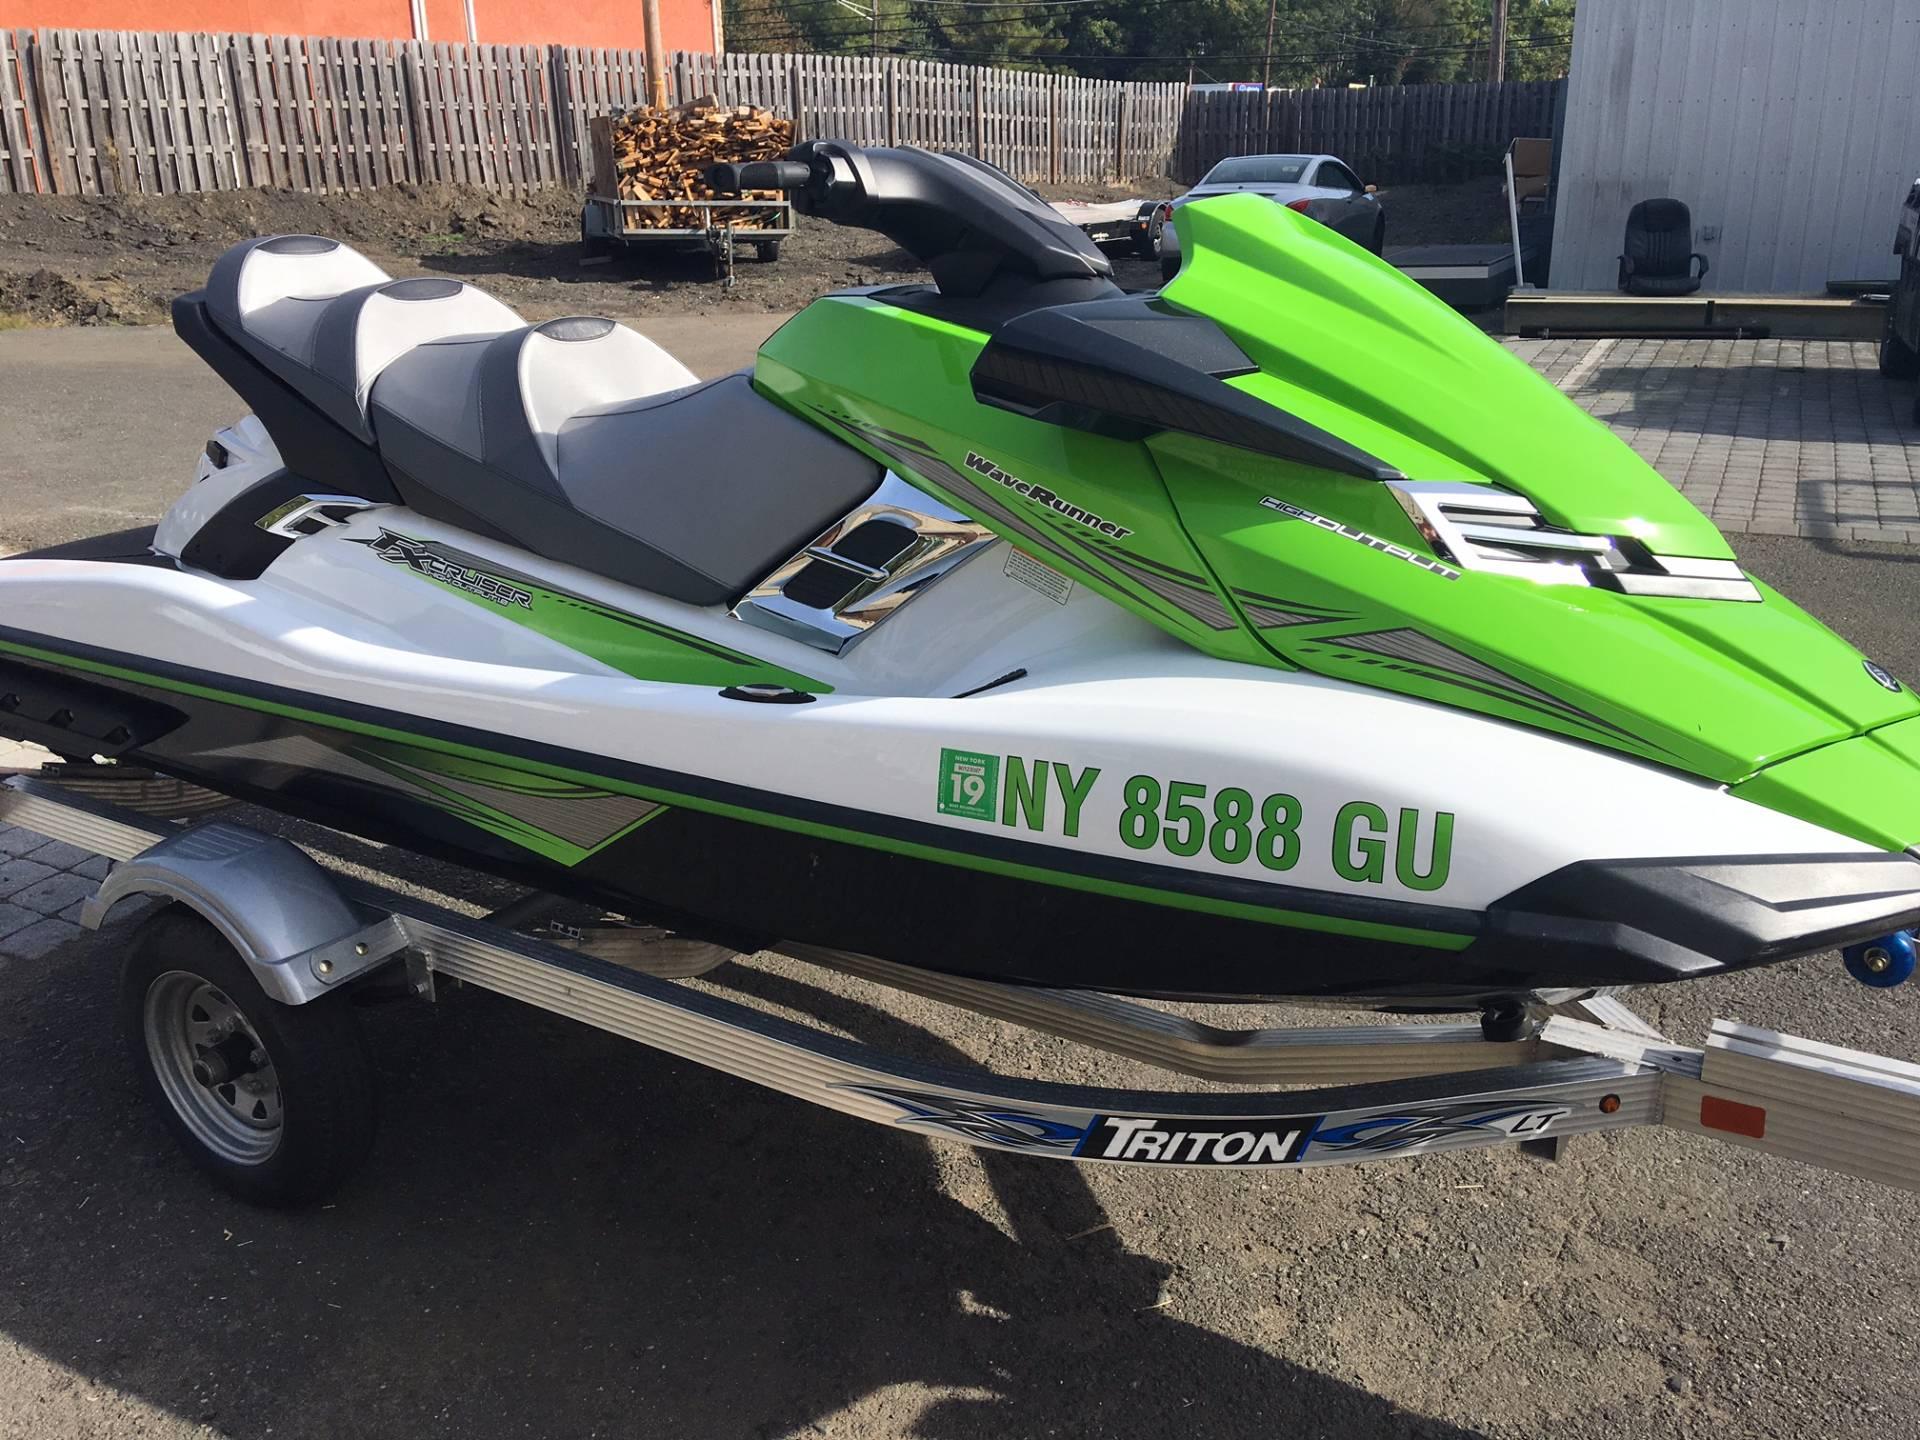 2016 Yamaha FX Cruiser HO for sale 78139